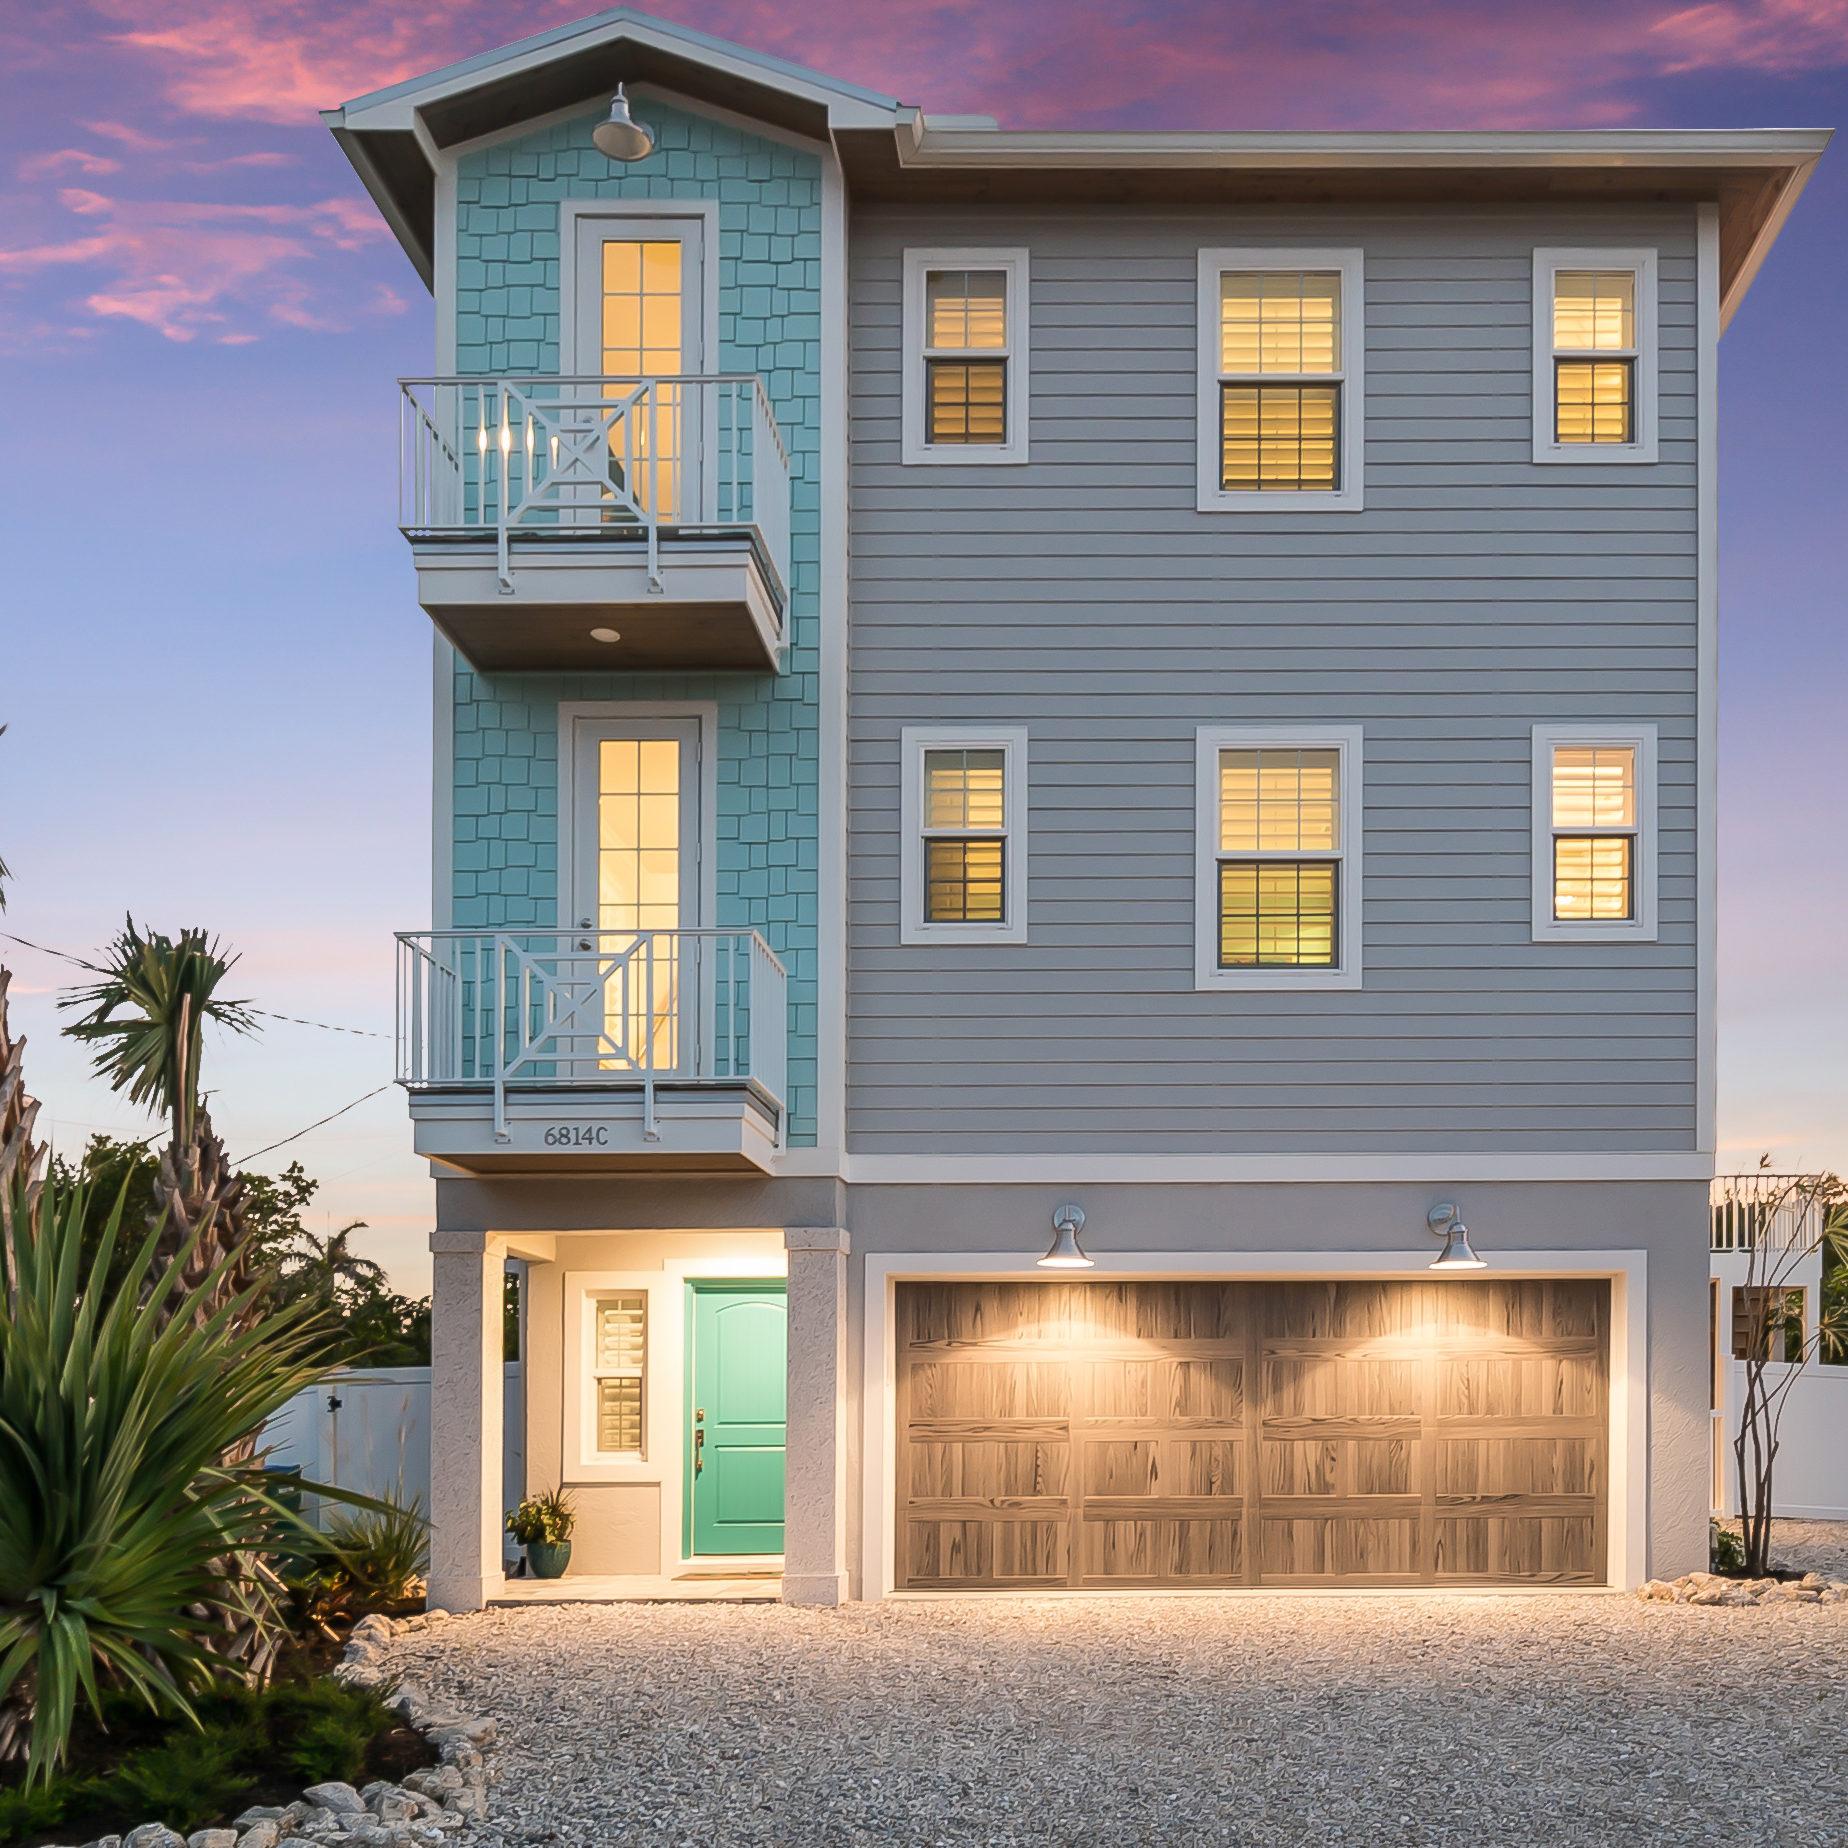 Beach House Anna Maria Island: Interior Design And Home Staging